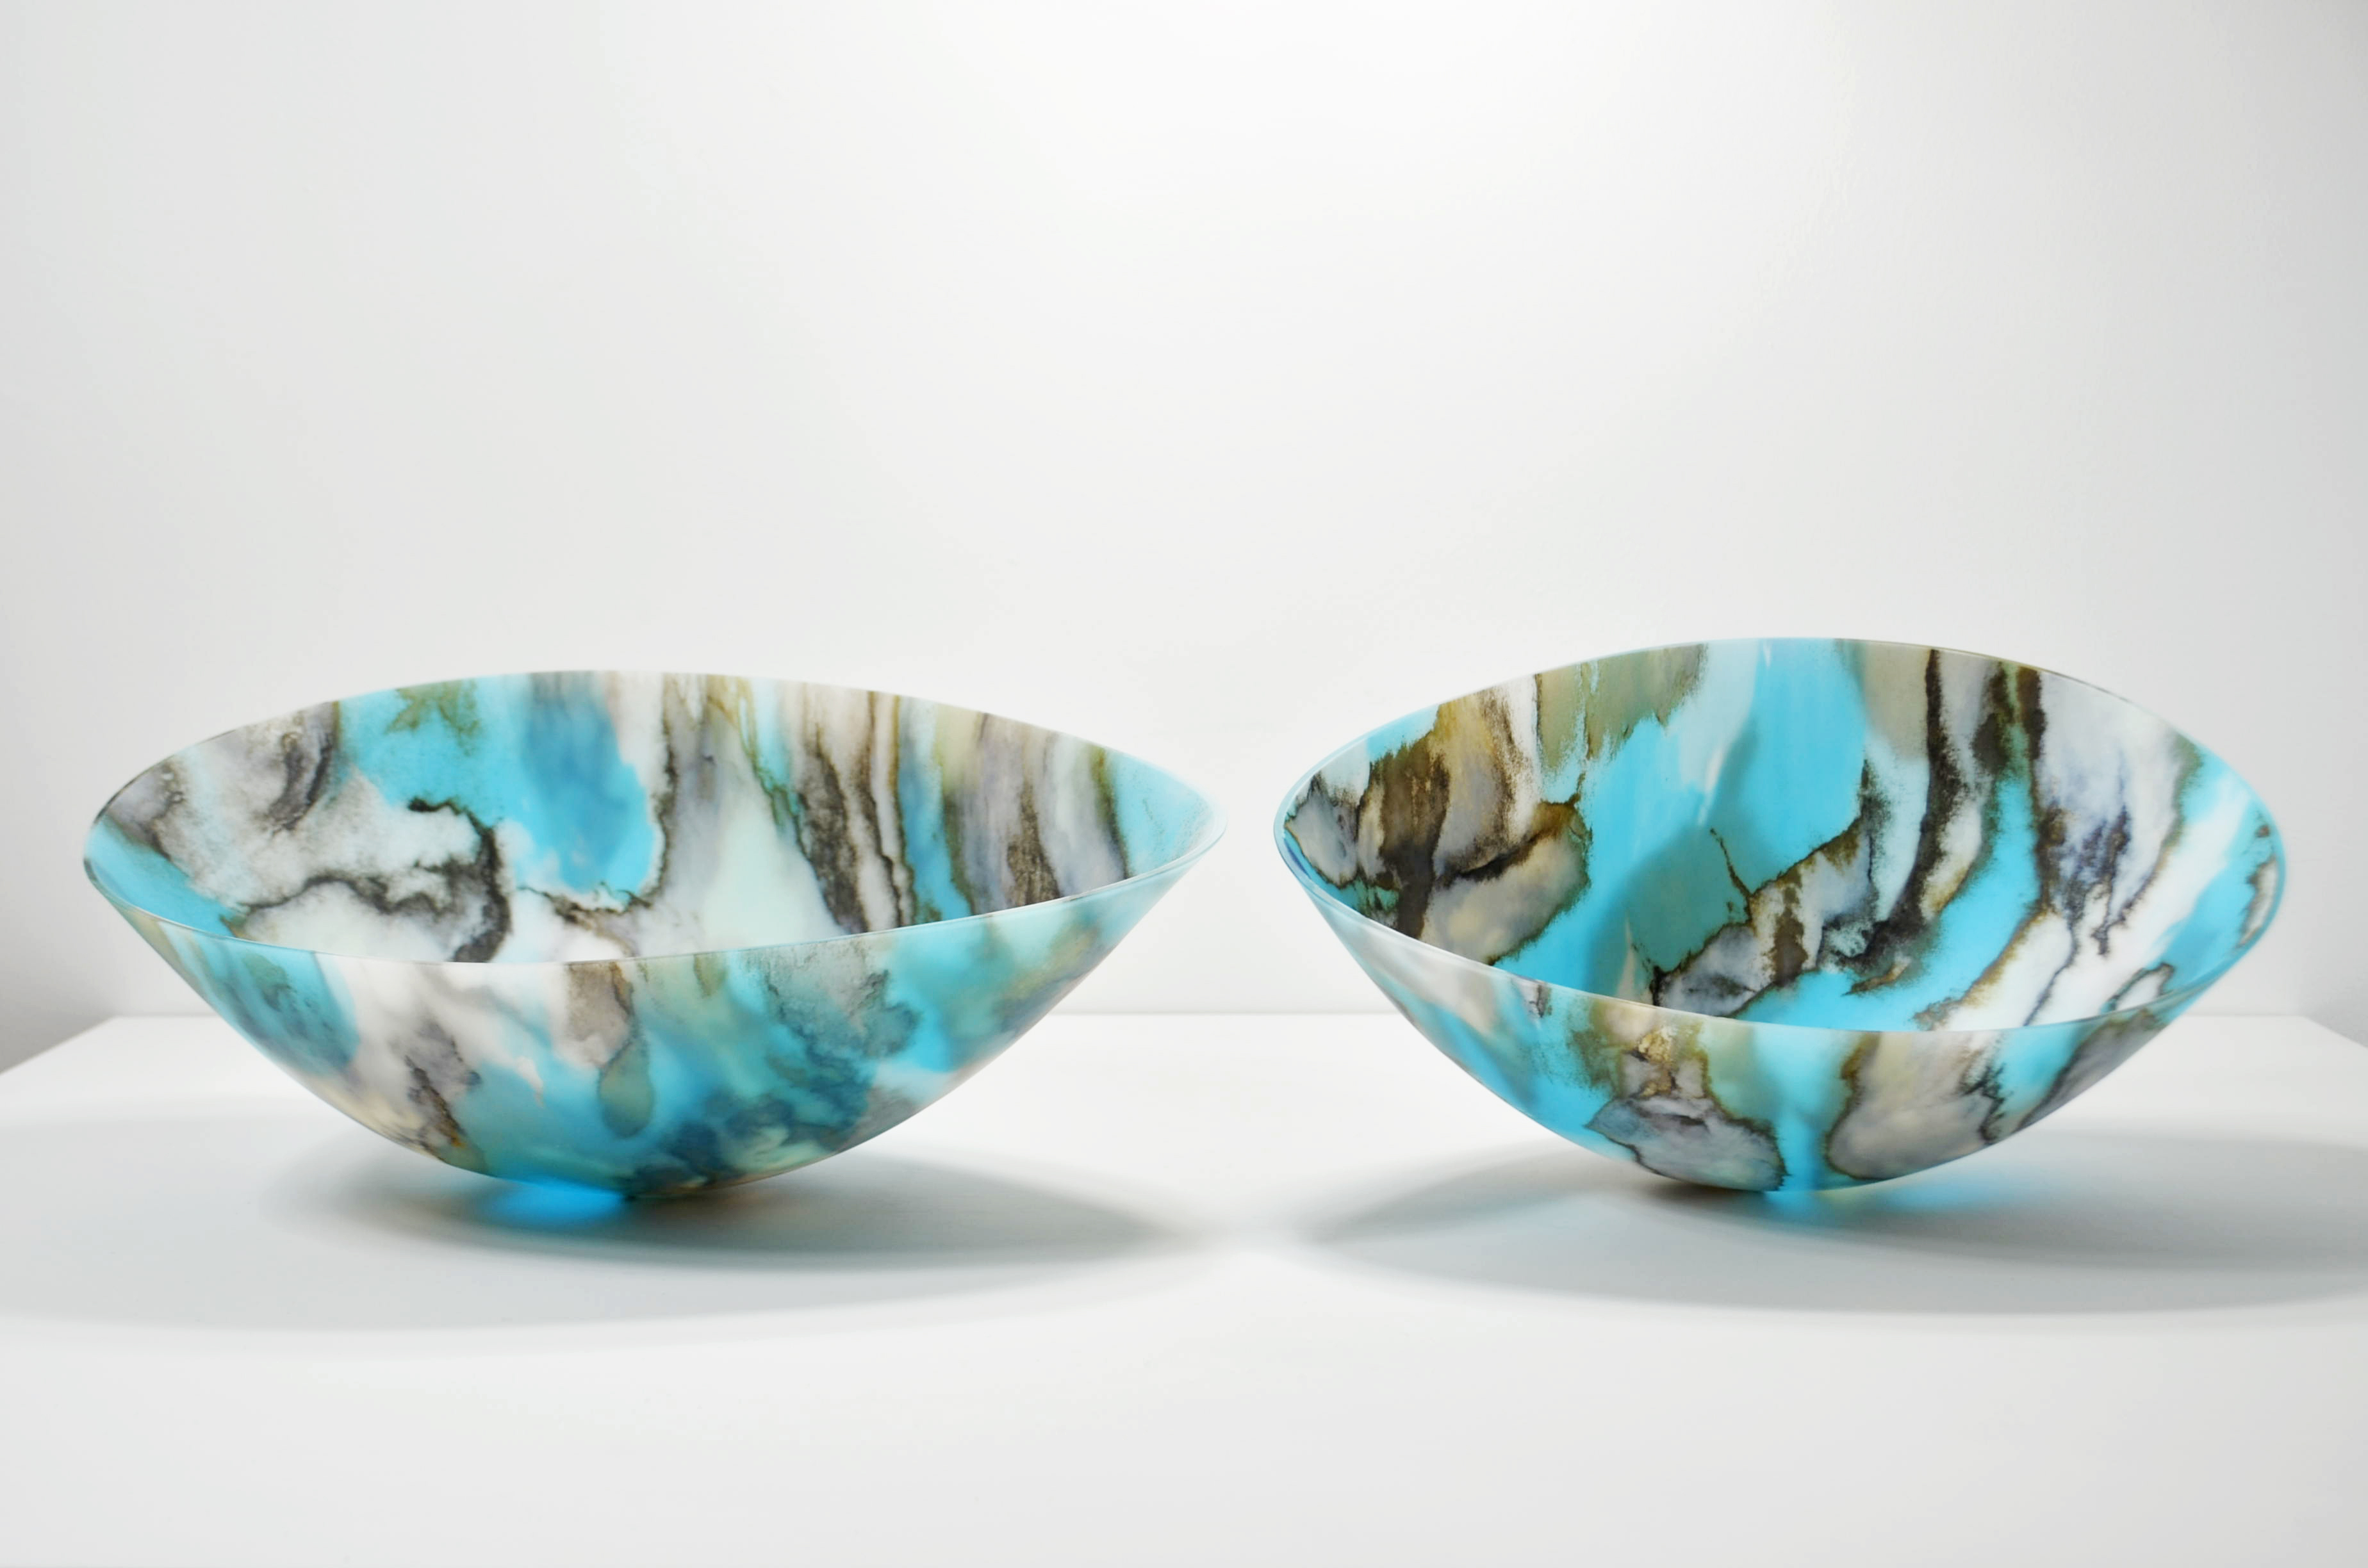 The Best of Glass Sculpture and Glasswork Art: Amanda Simmons glasswork The Best of Glass Sculpture and Glasswork Art: Amanda Simmons Amanda Simmons Skyform Duo